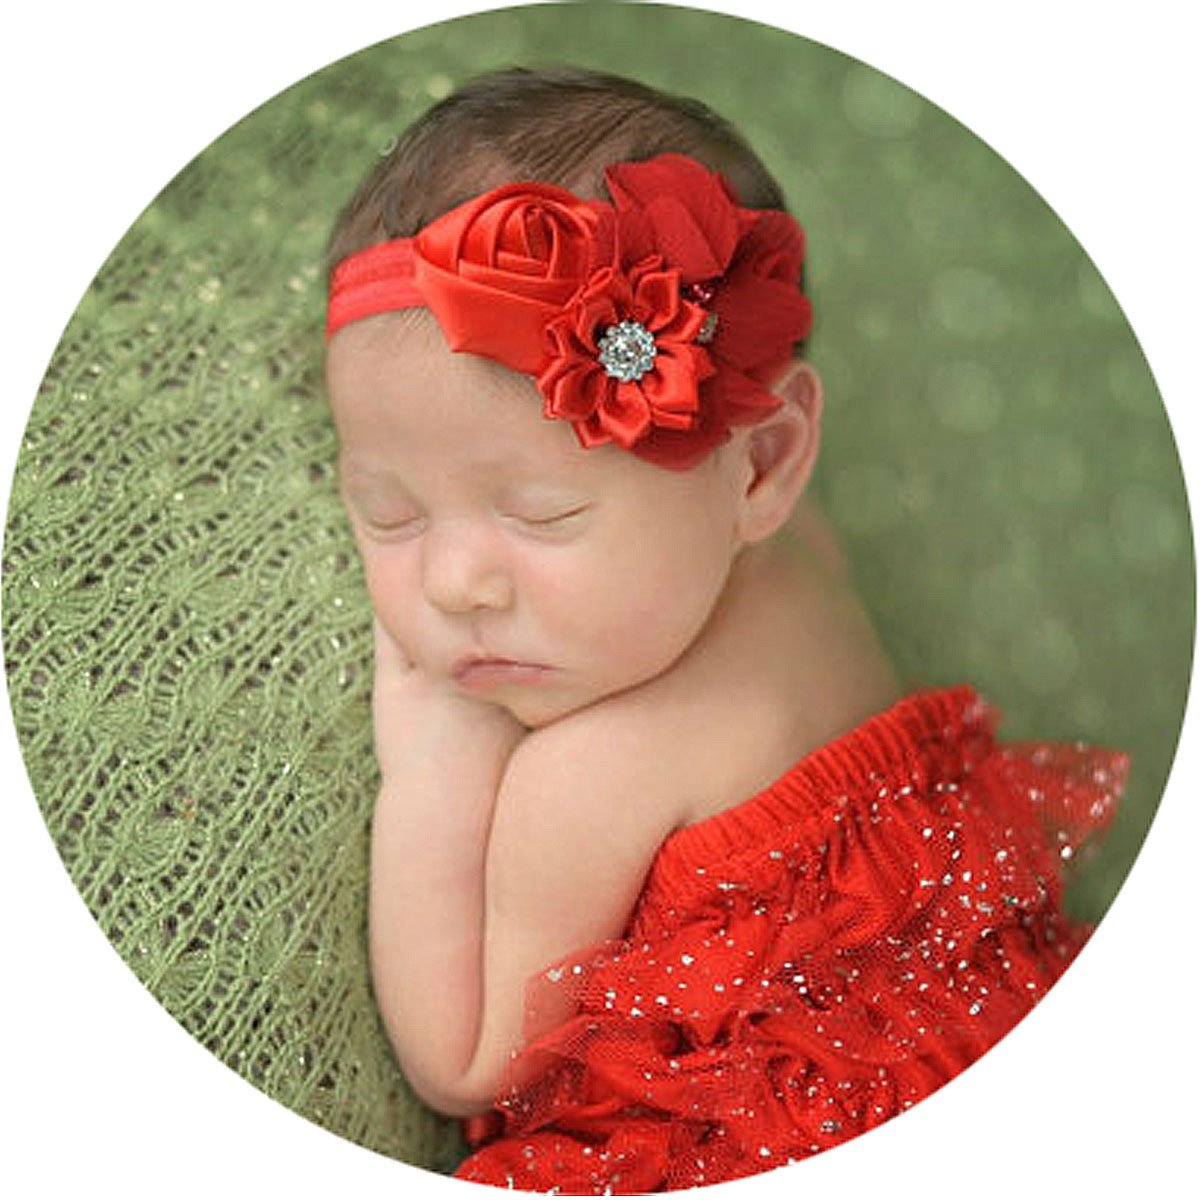 Baby Girl Hair Bow Christmas Holiday Red Chiffon Flower Pearl Newborn Headband